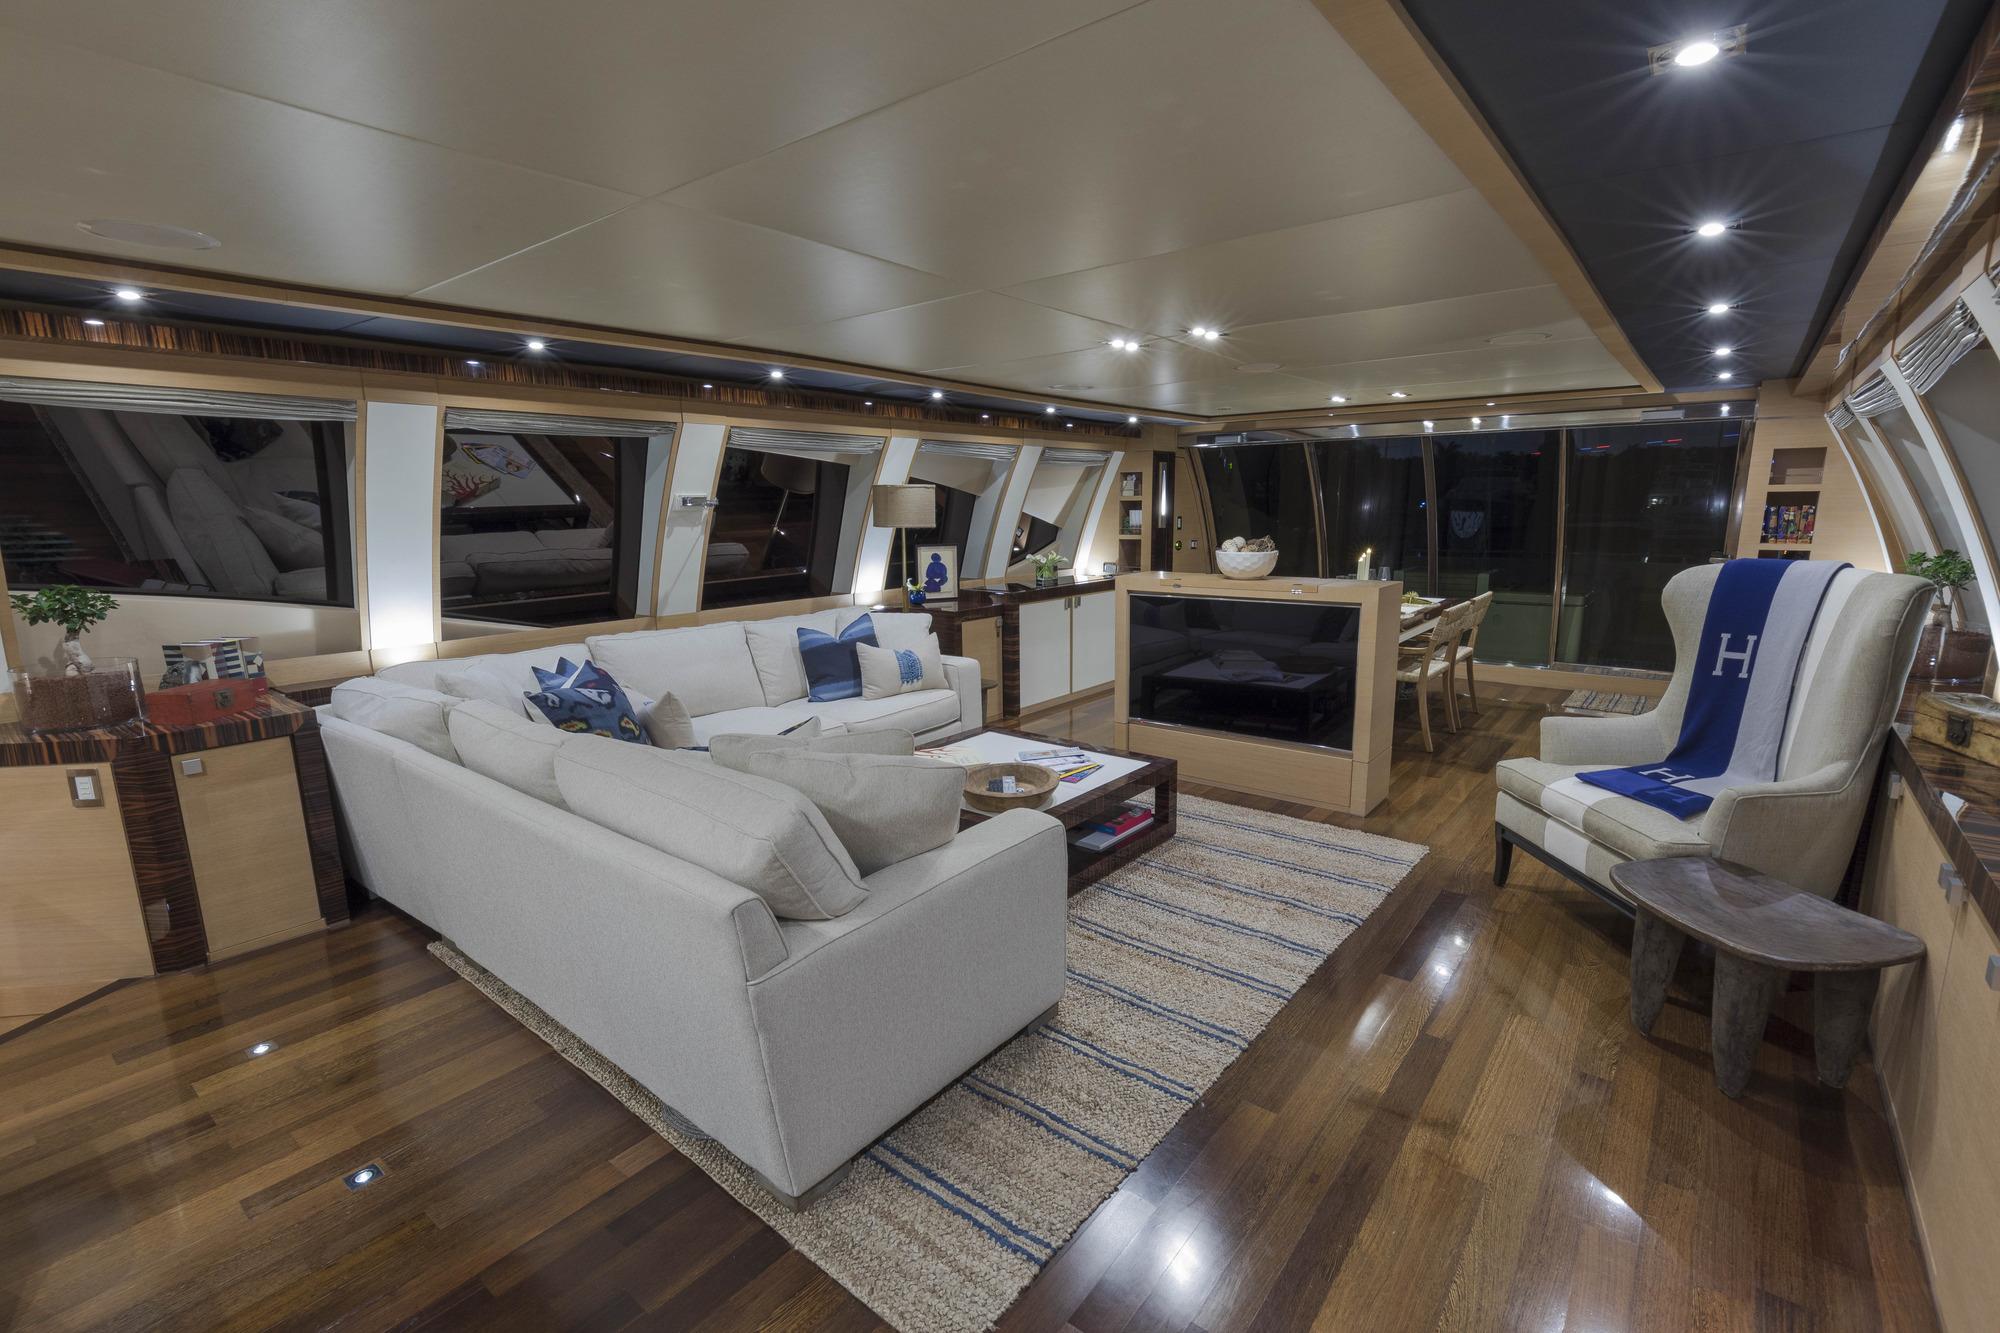 Motor yacht BW - Salon view aft